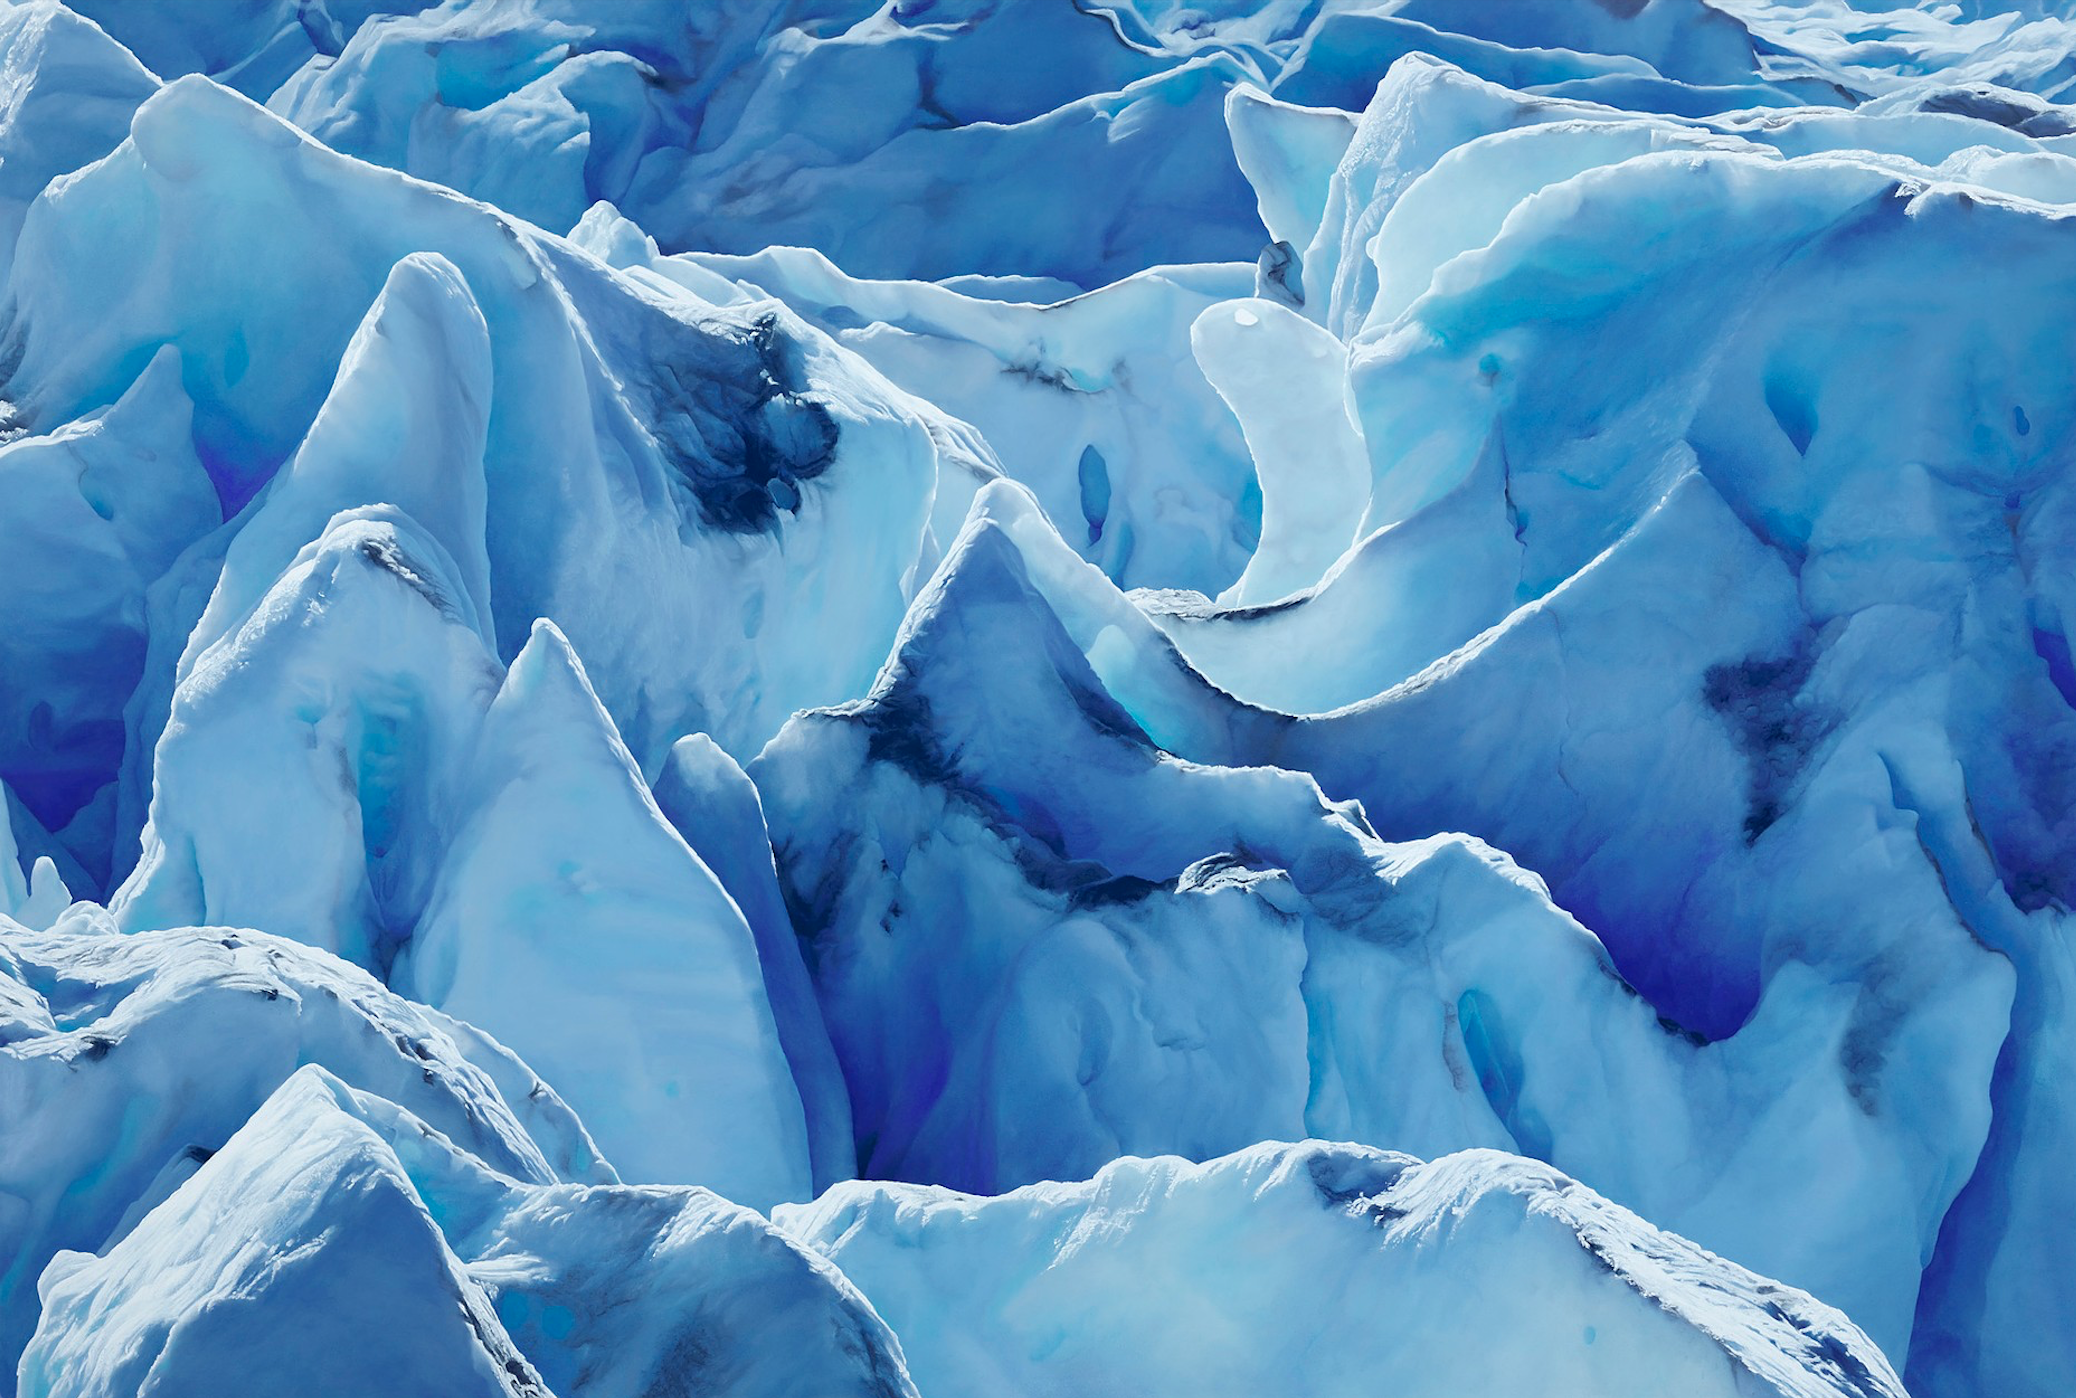 Incredible Drawings of Perito Moreno Glacier